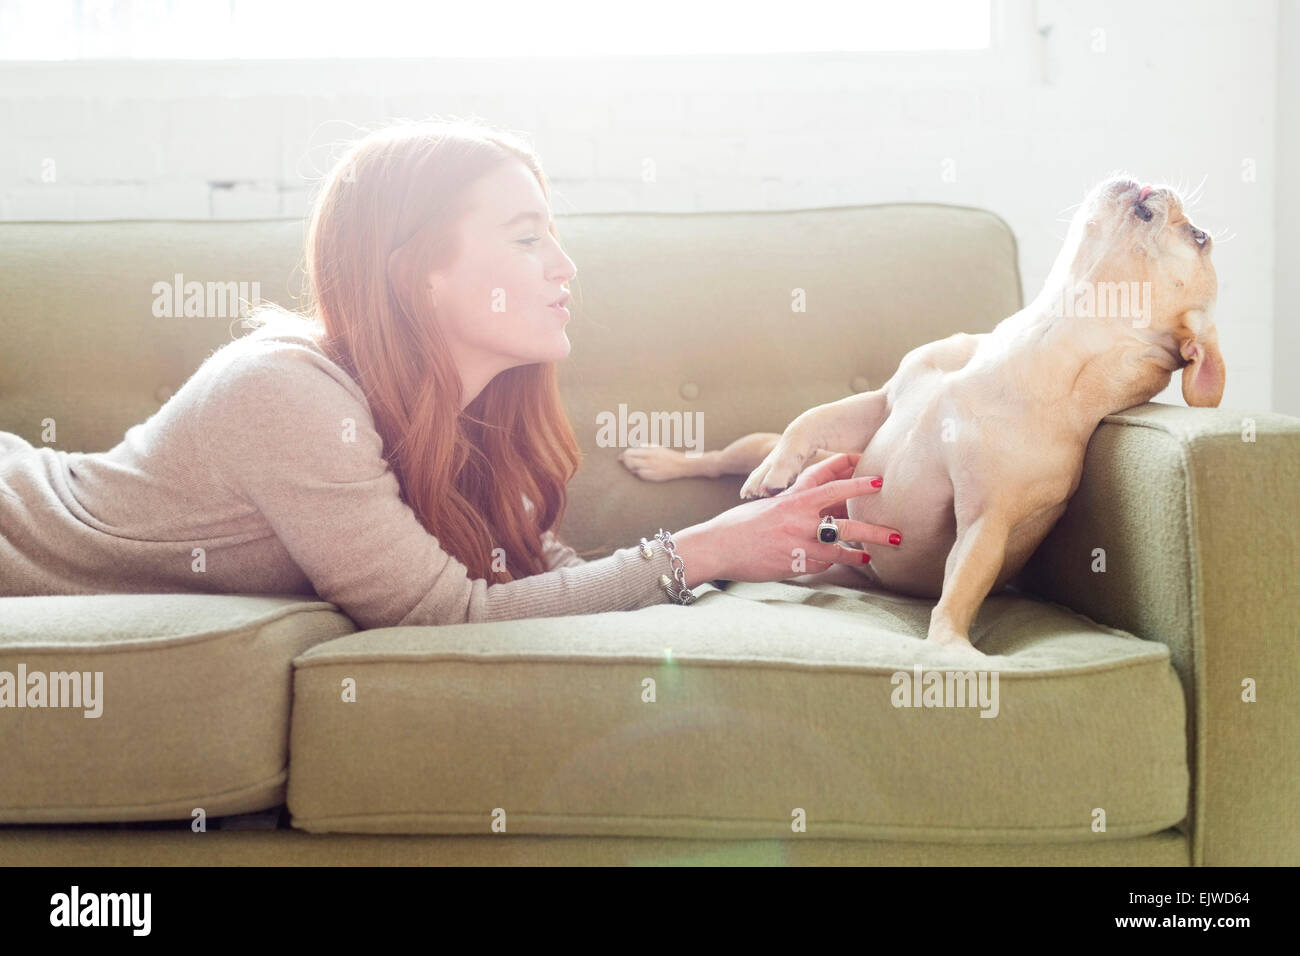 Woman lying on sofa stroking pug - Stock Image